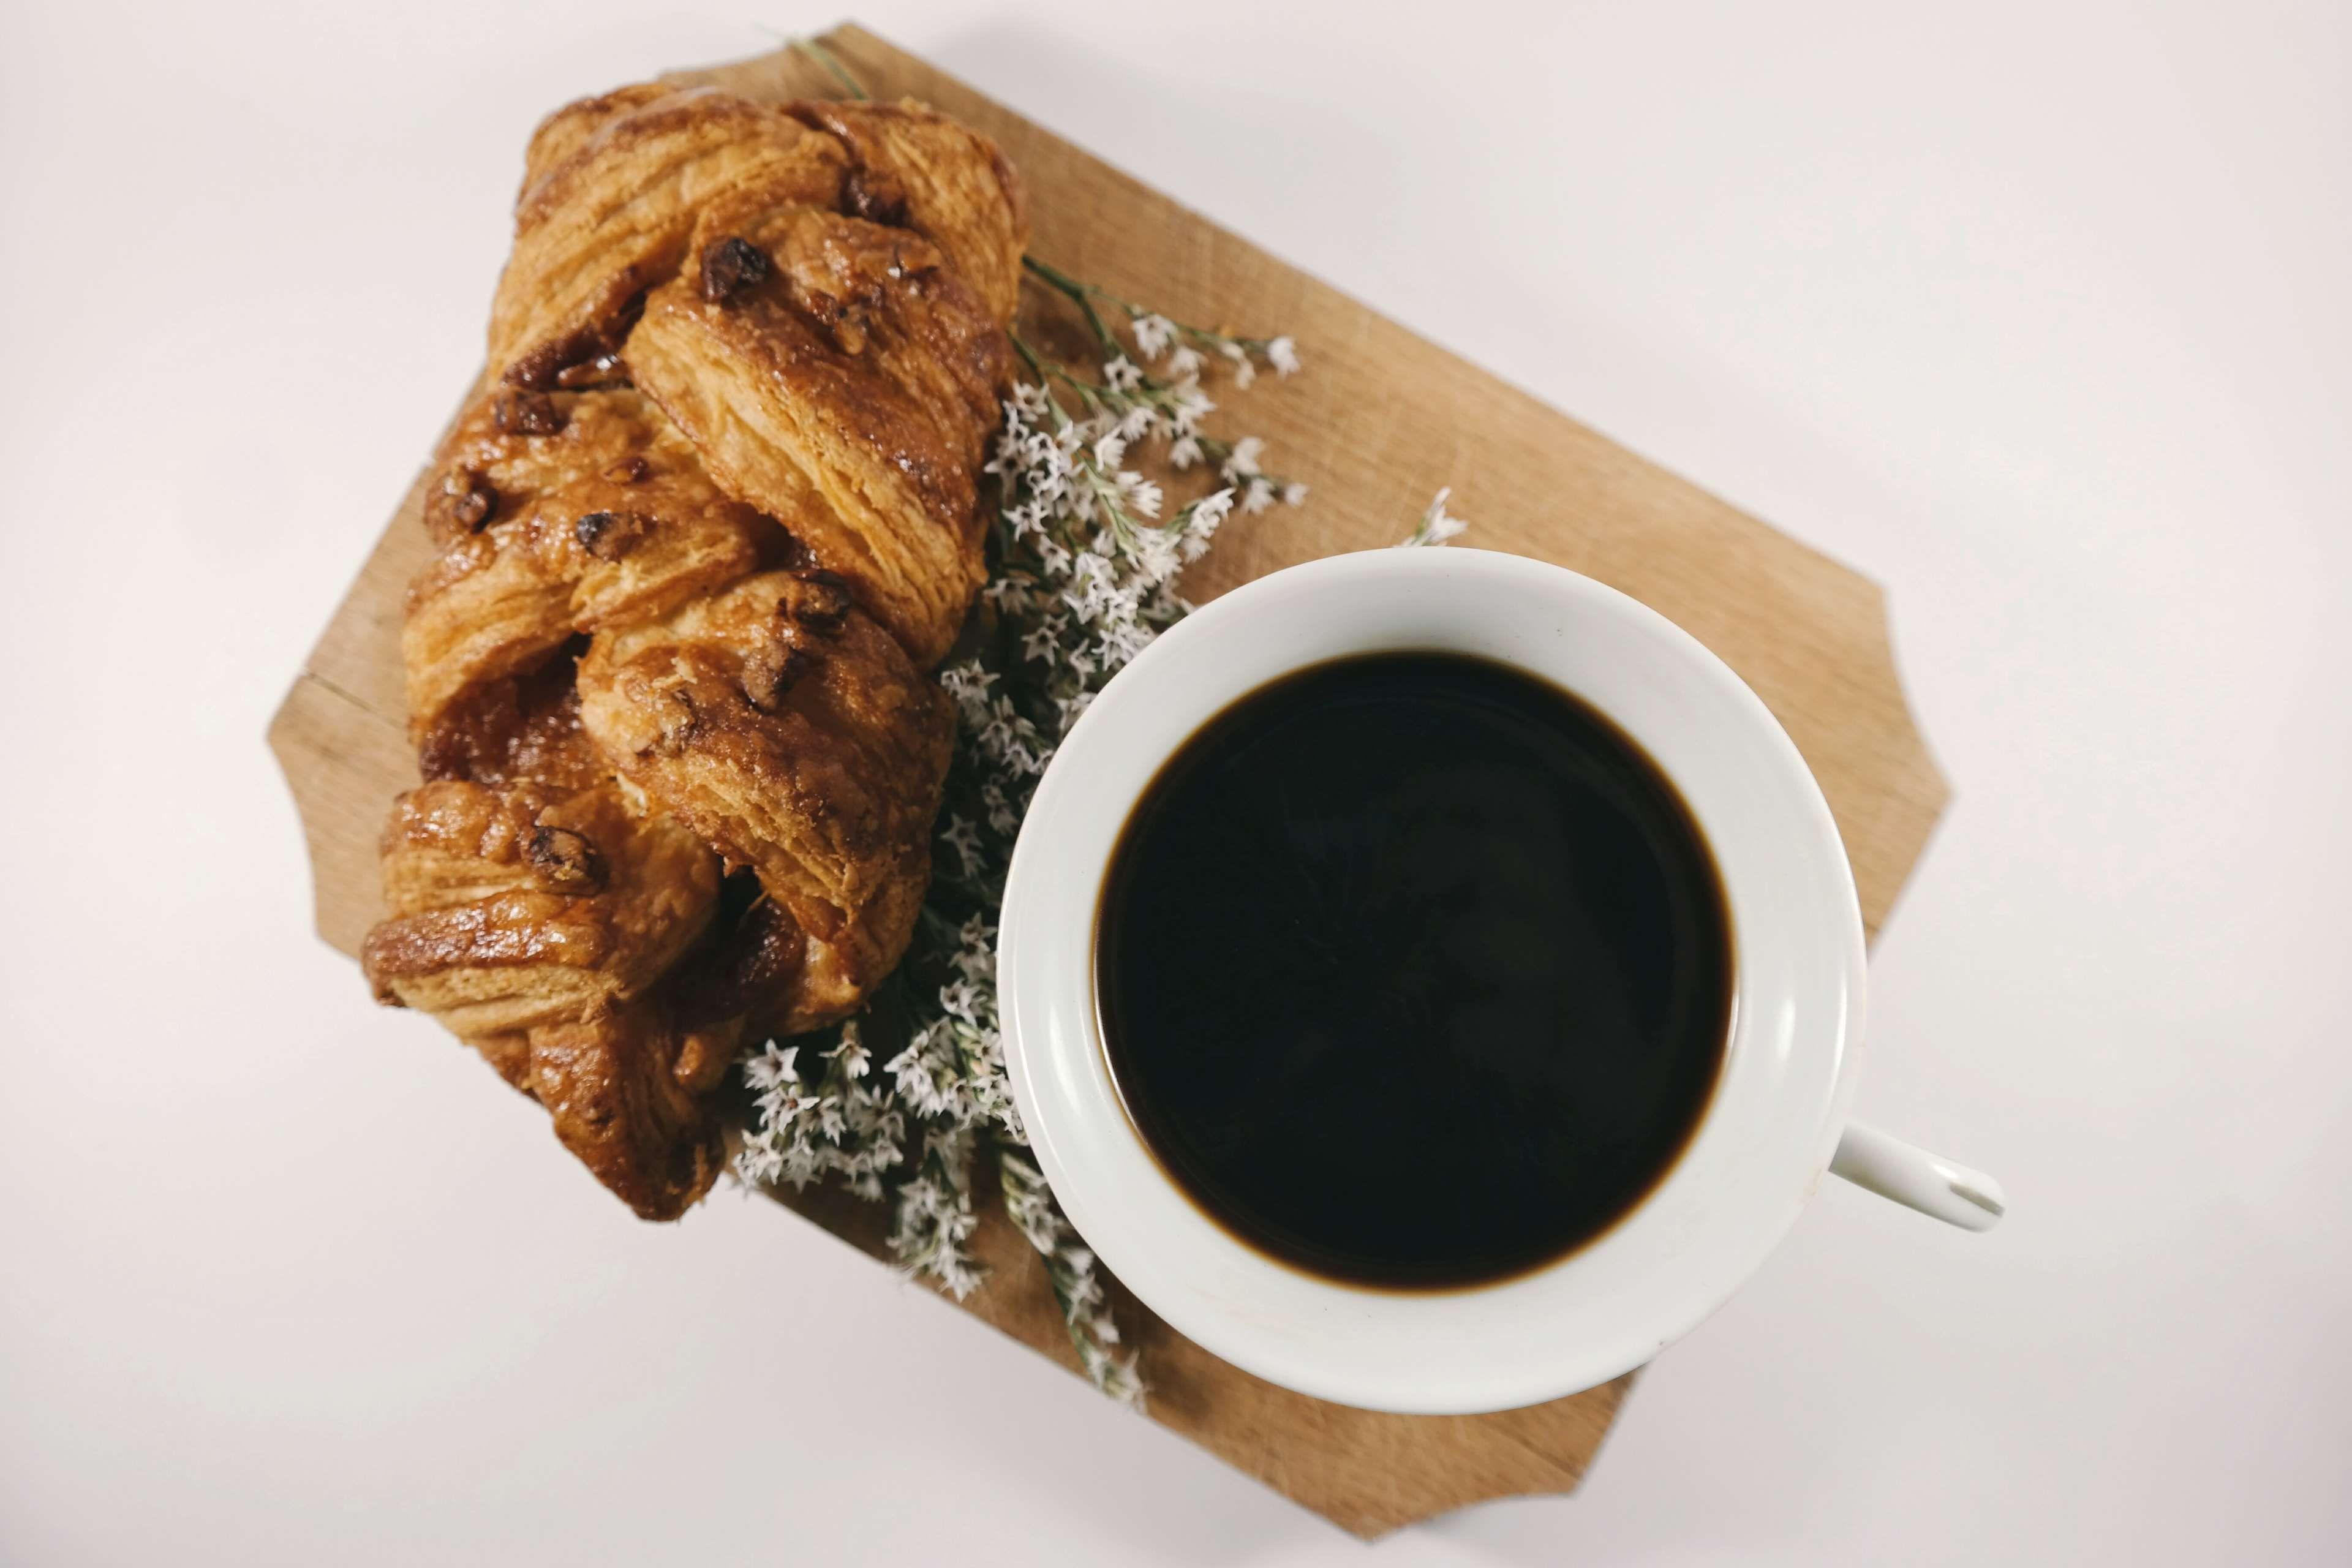 #black coffee #bread #breakfast #caffeine #coffee #coffee drink #coffee mug #cup #cup of coffee #dark #delicious #flowers #food #mug #table #wood #wooden